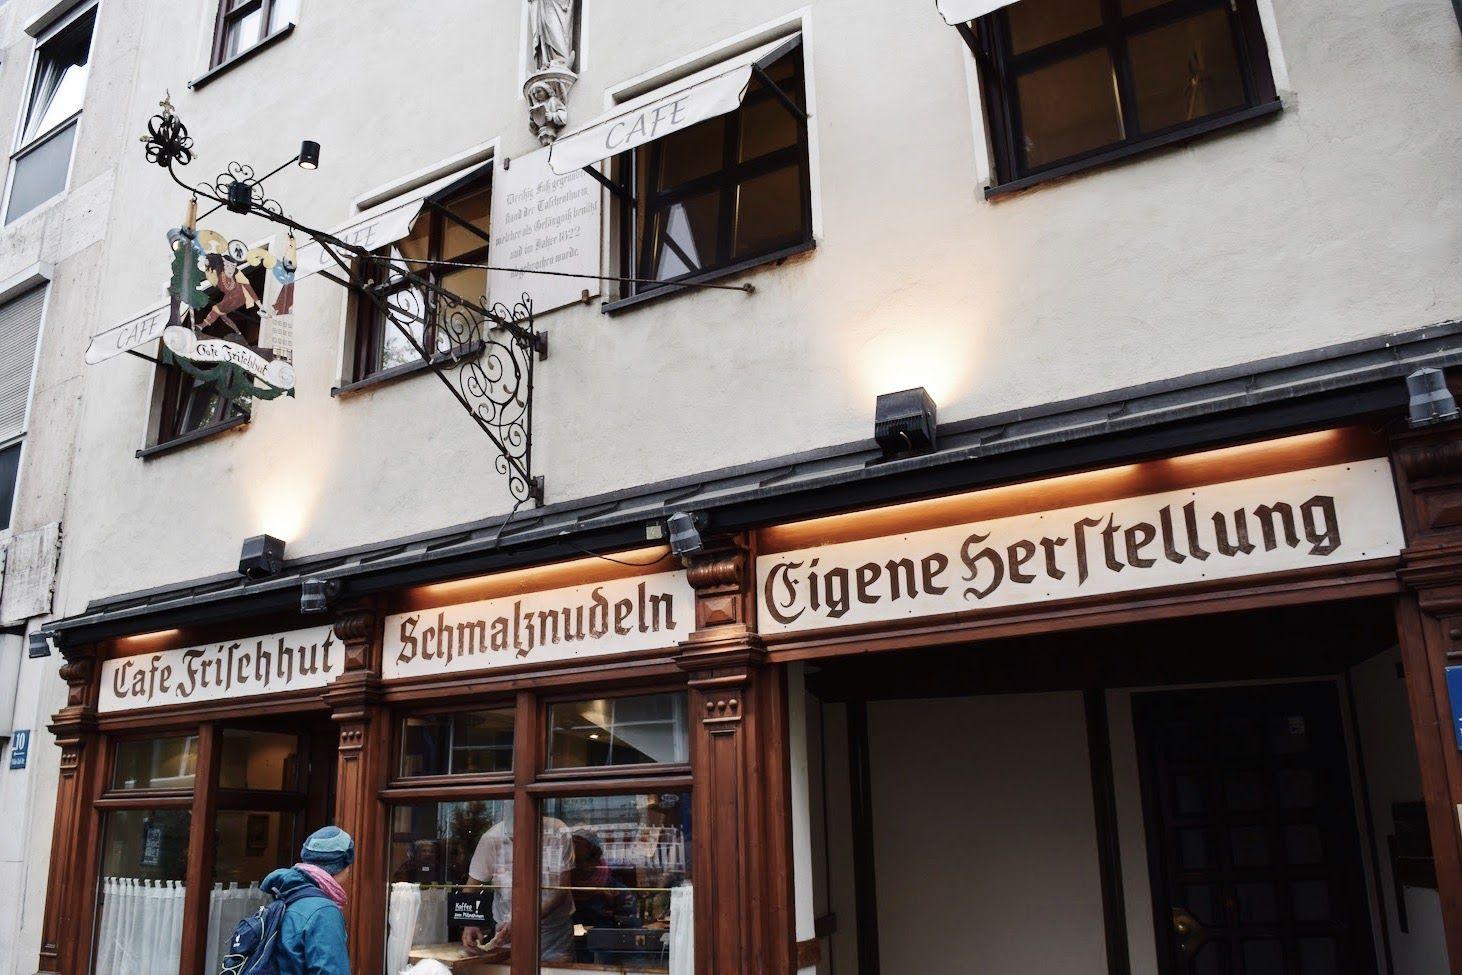 Cafe Frischhut Schmalznudel Entrance